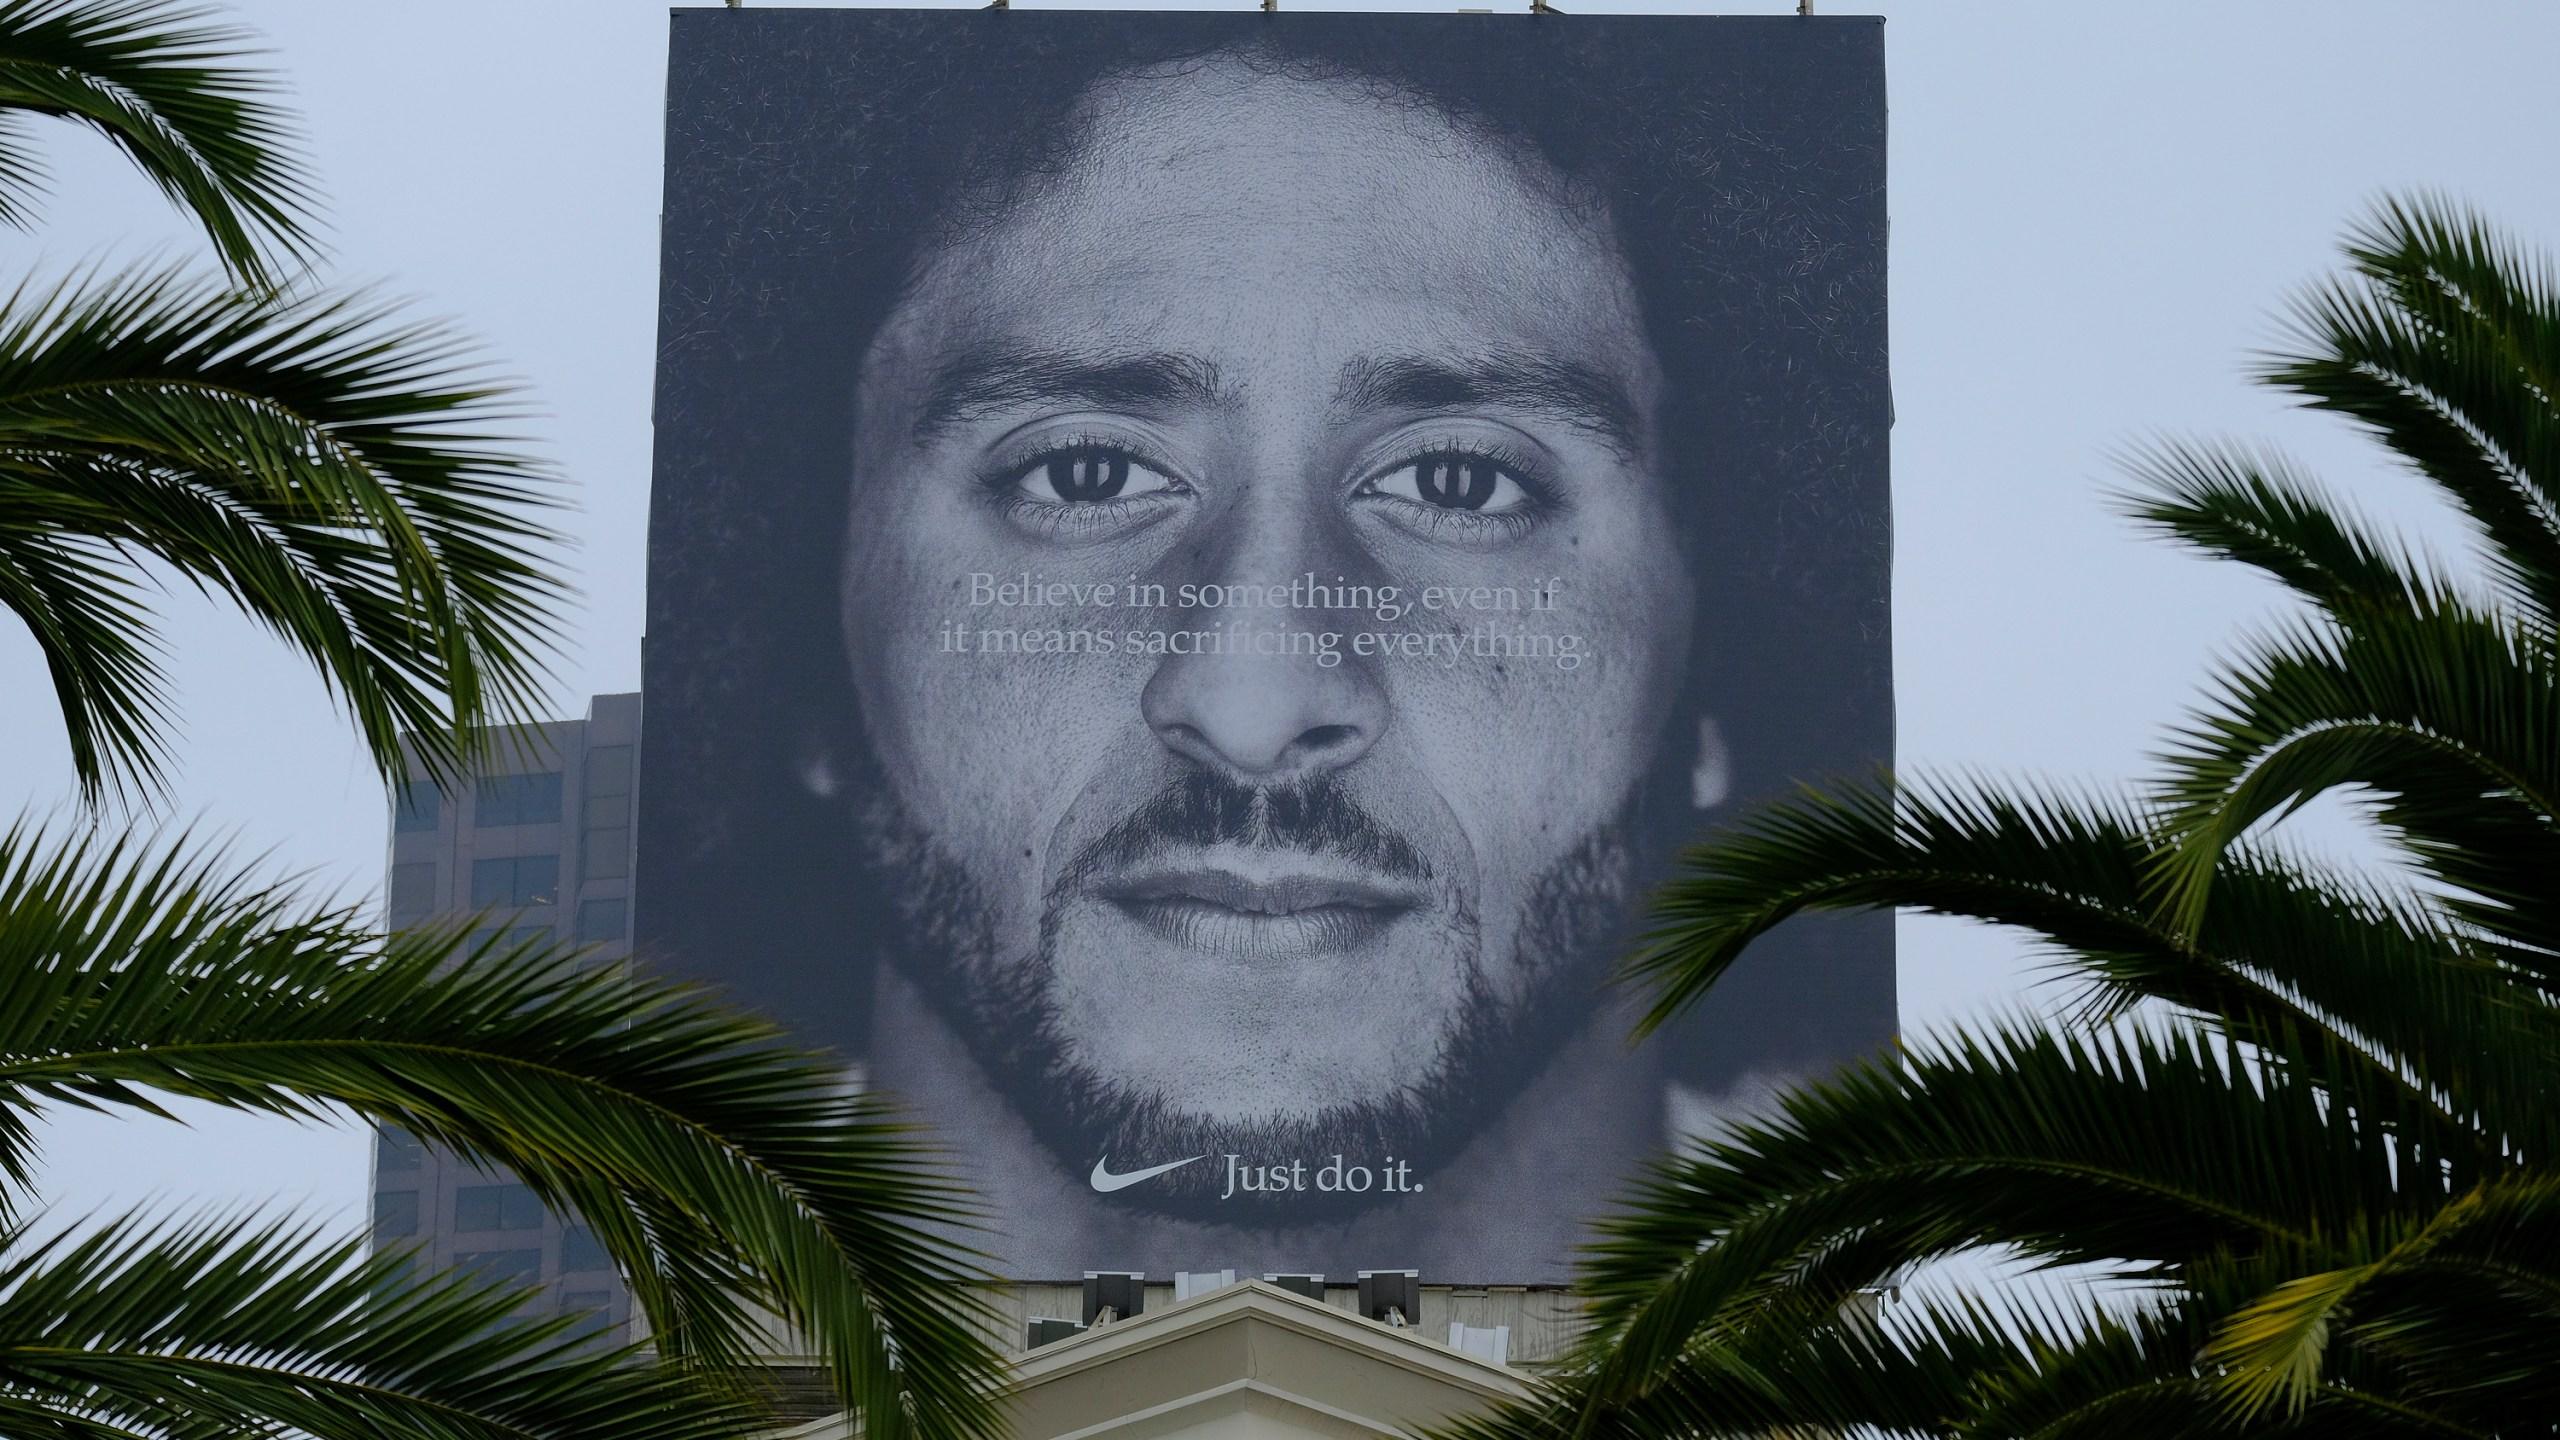 Kaepernick_Nike_88358-159532.jpg78350677